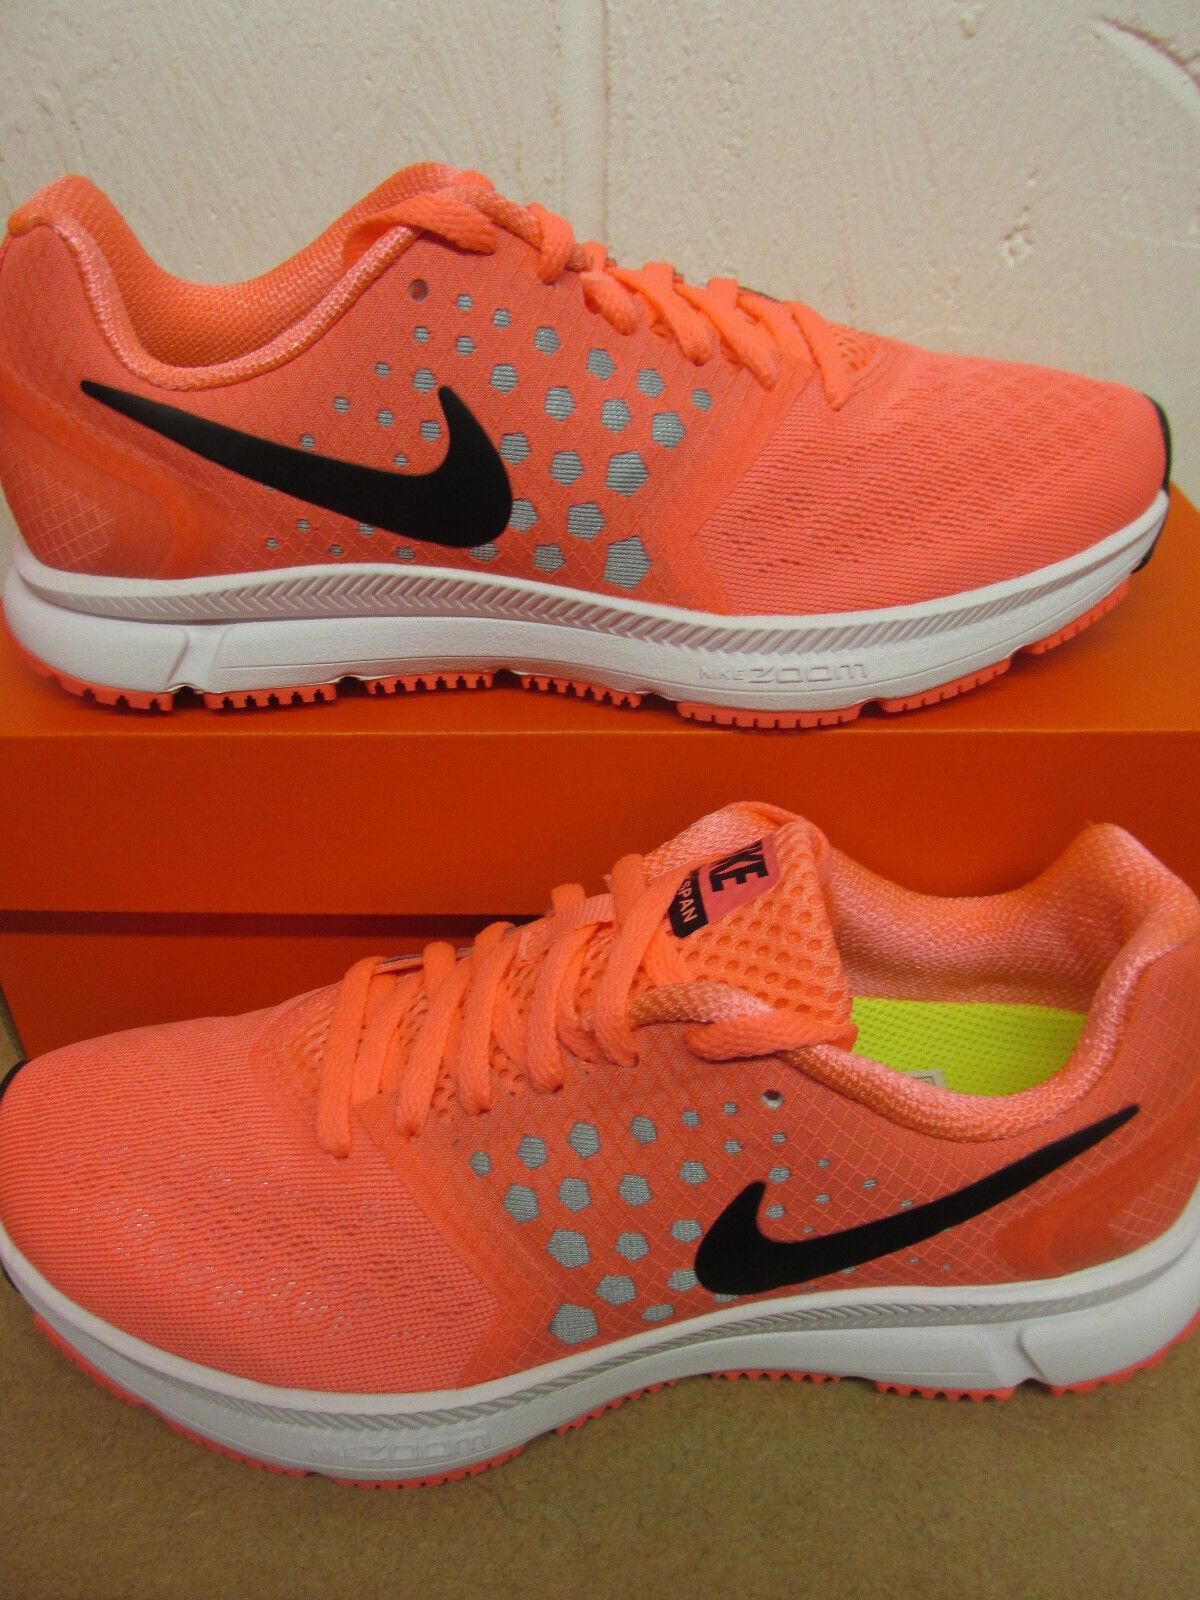 Nike 852450 Donna Zoom Campata Scarpe da Corsa 852450 Nike 601 Scarpe da Tennis 8deb1a